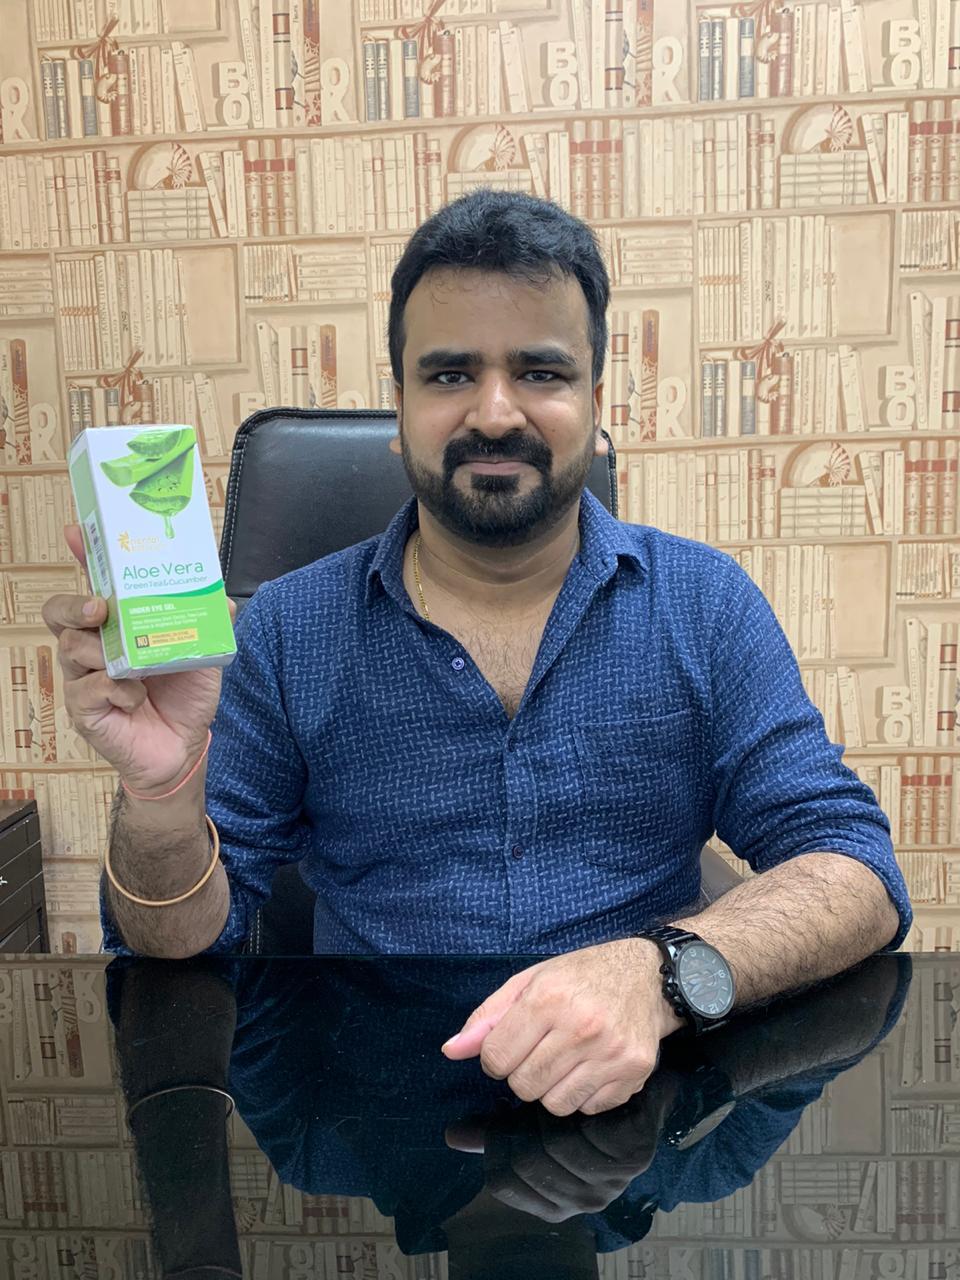 Oriental Botanics Aloe Vera Green Tea & Cucumber Under Eye Gel pic 1-The best under eye gel purchase ever !-By maayankjaiin